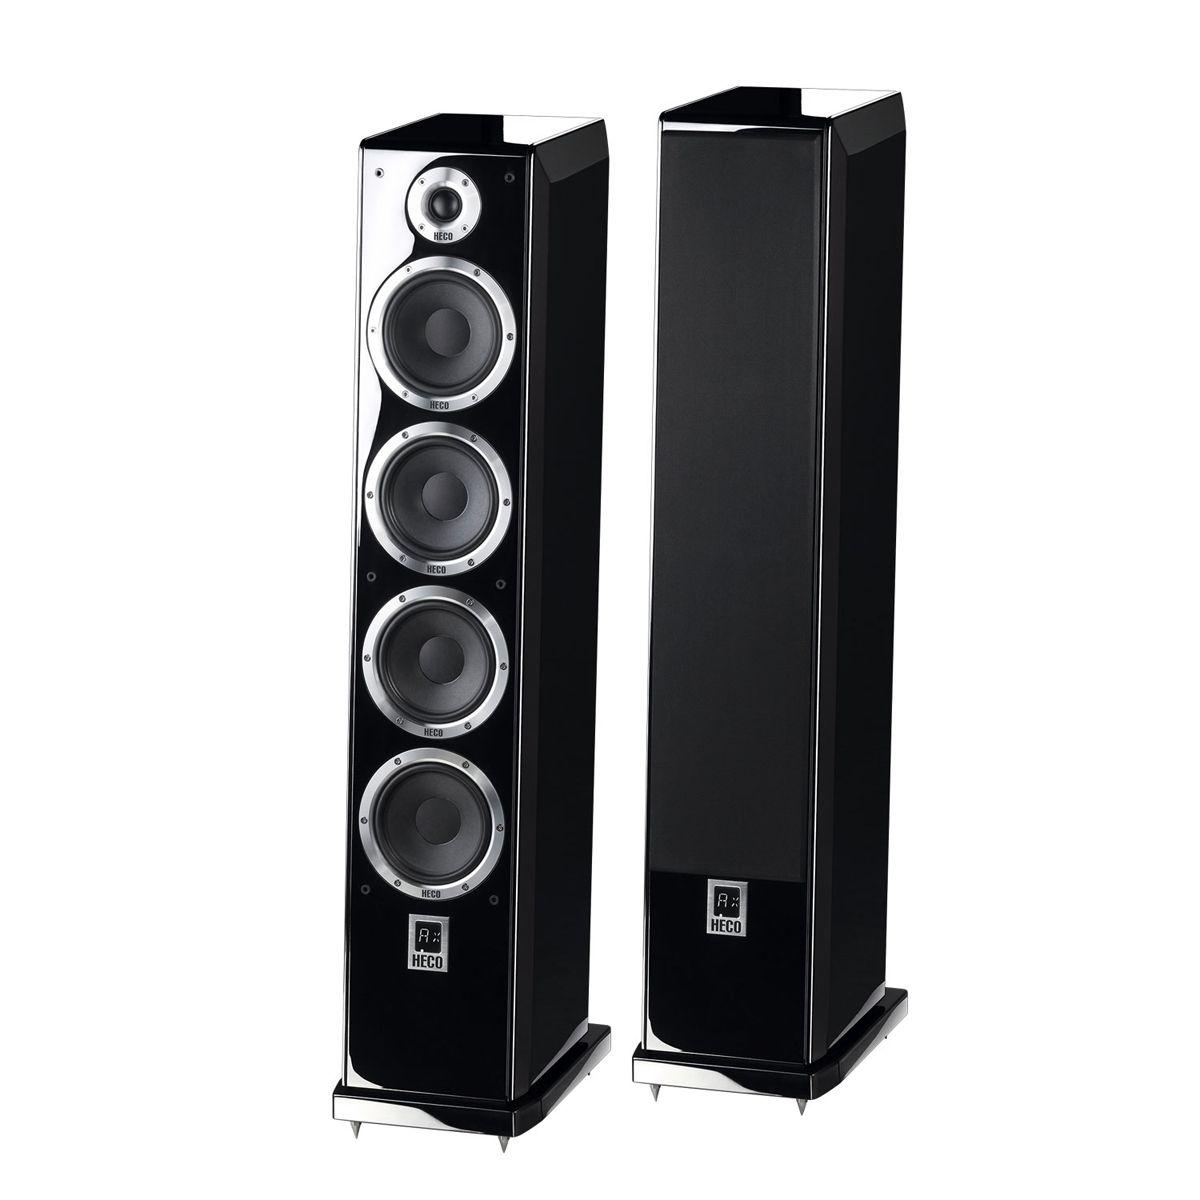 HECO Heco Ascada 600 Tower, Vollaktive Bluetooth®-Standlautsprecher